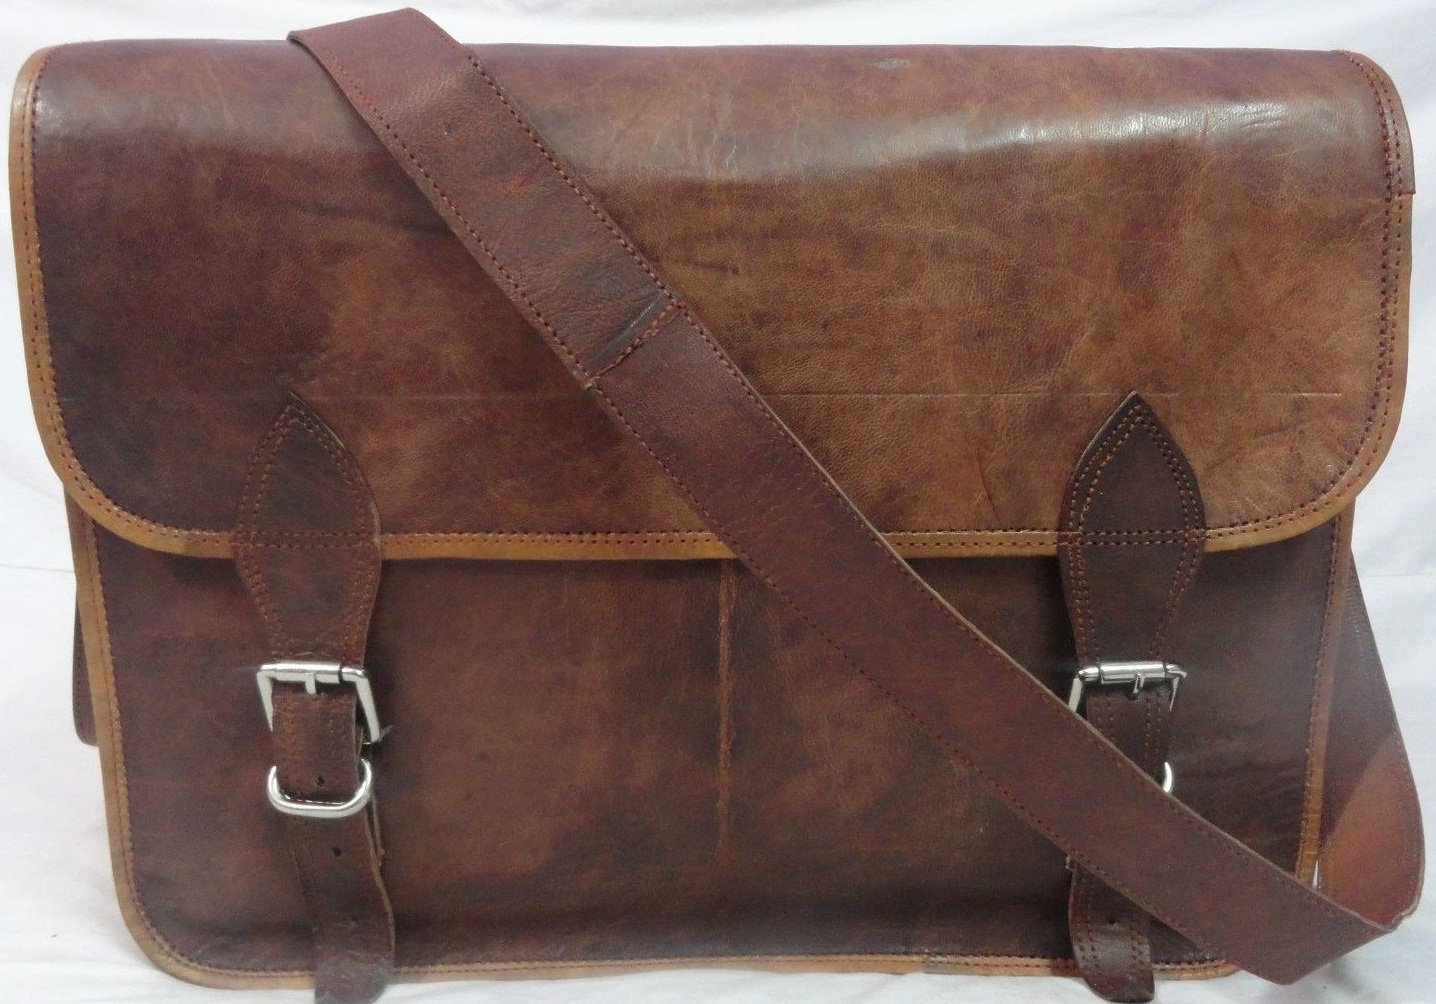 QualityArt Real Leather Shoulder Bag Women Purse Crossbody Satchel Laptop Bag Diaper Bag Travel Bag Messenger Bag